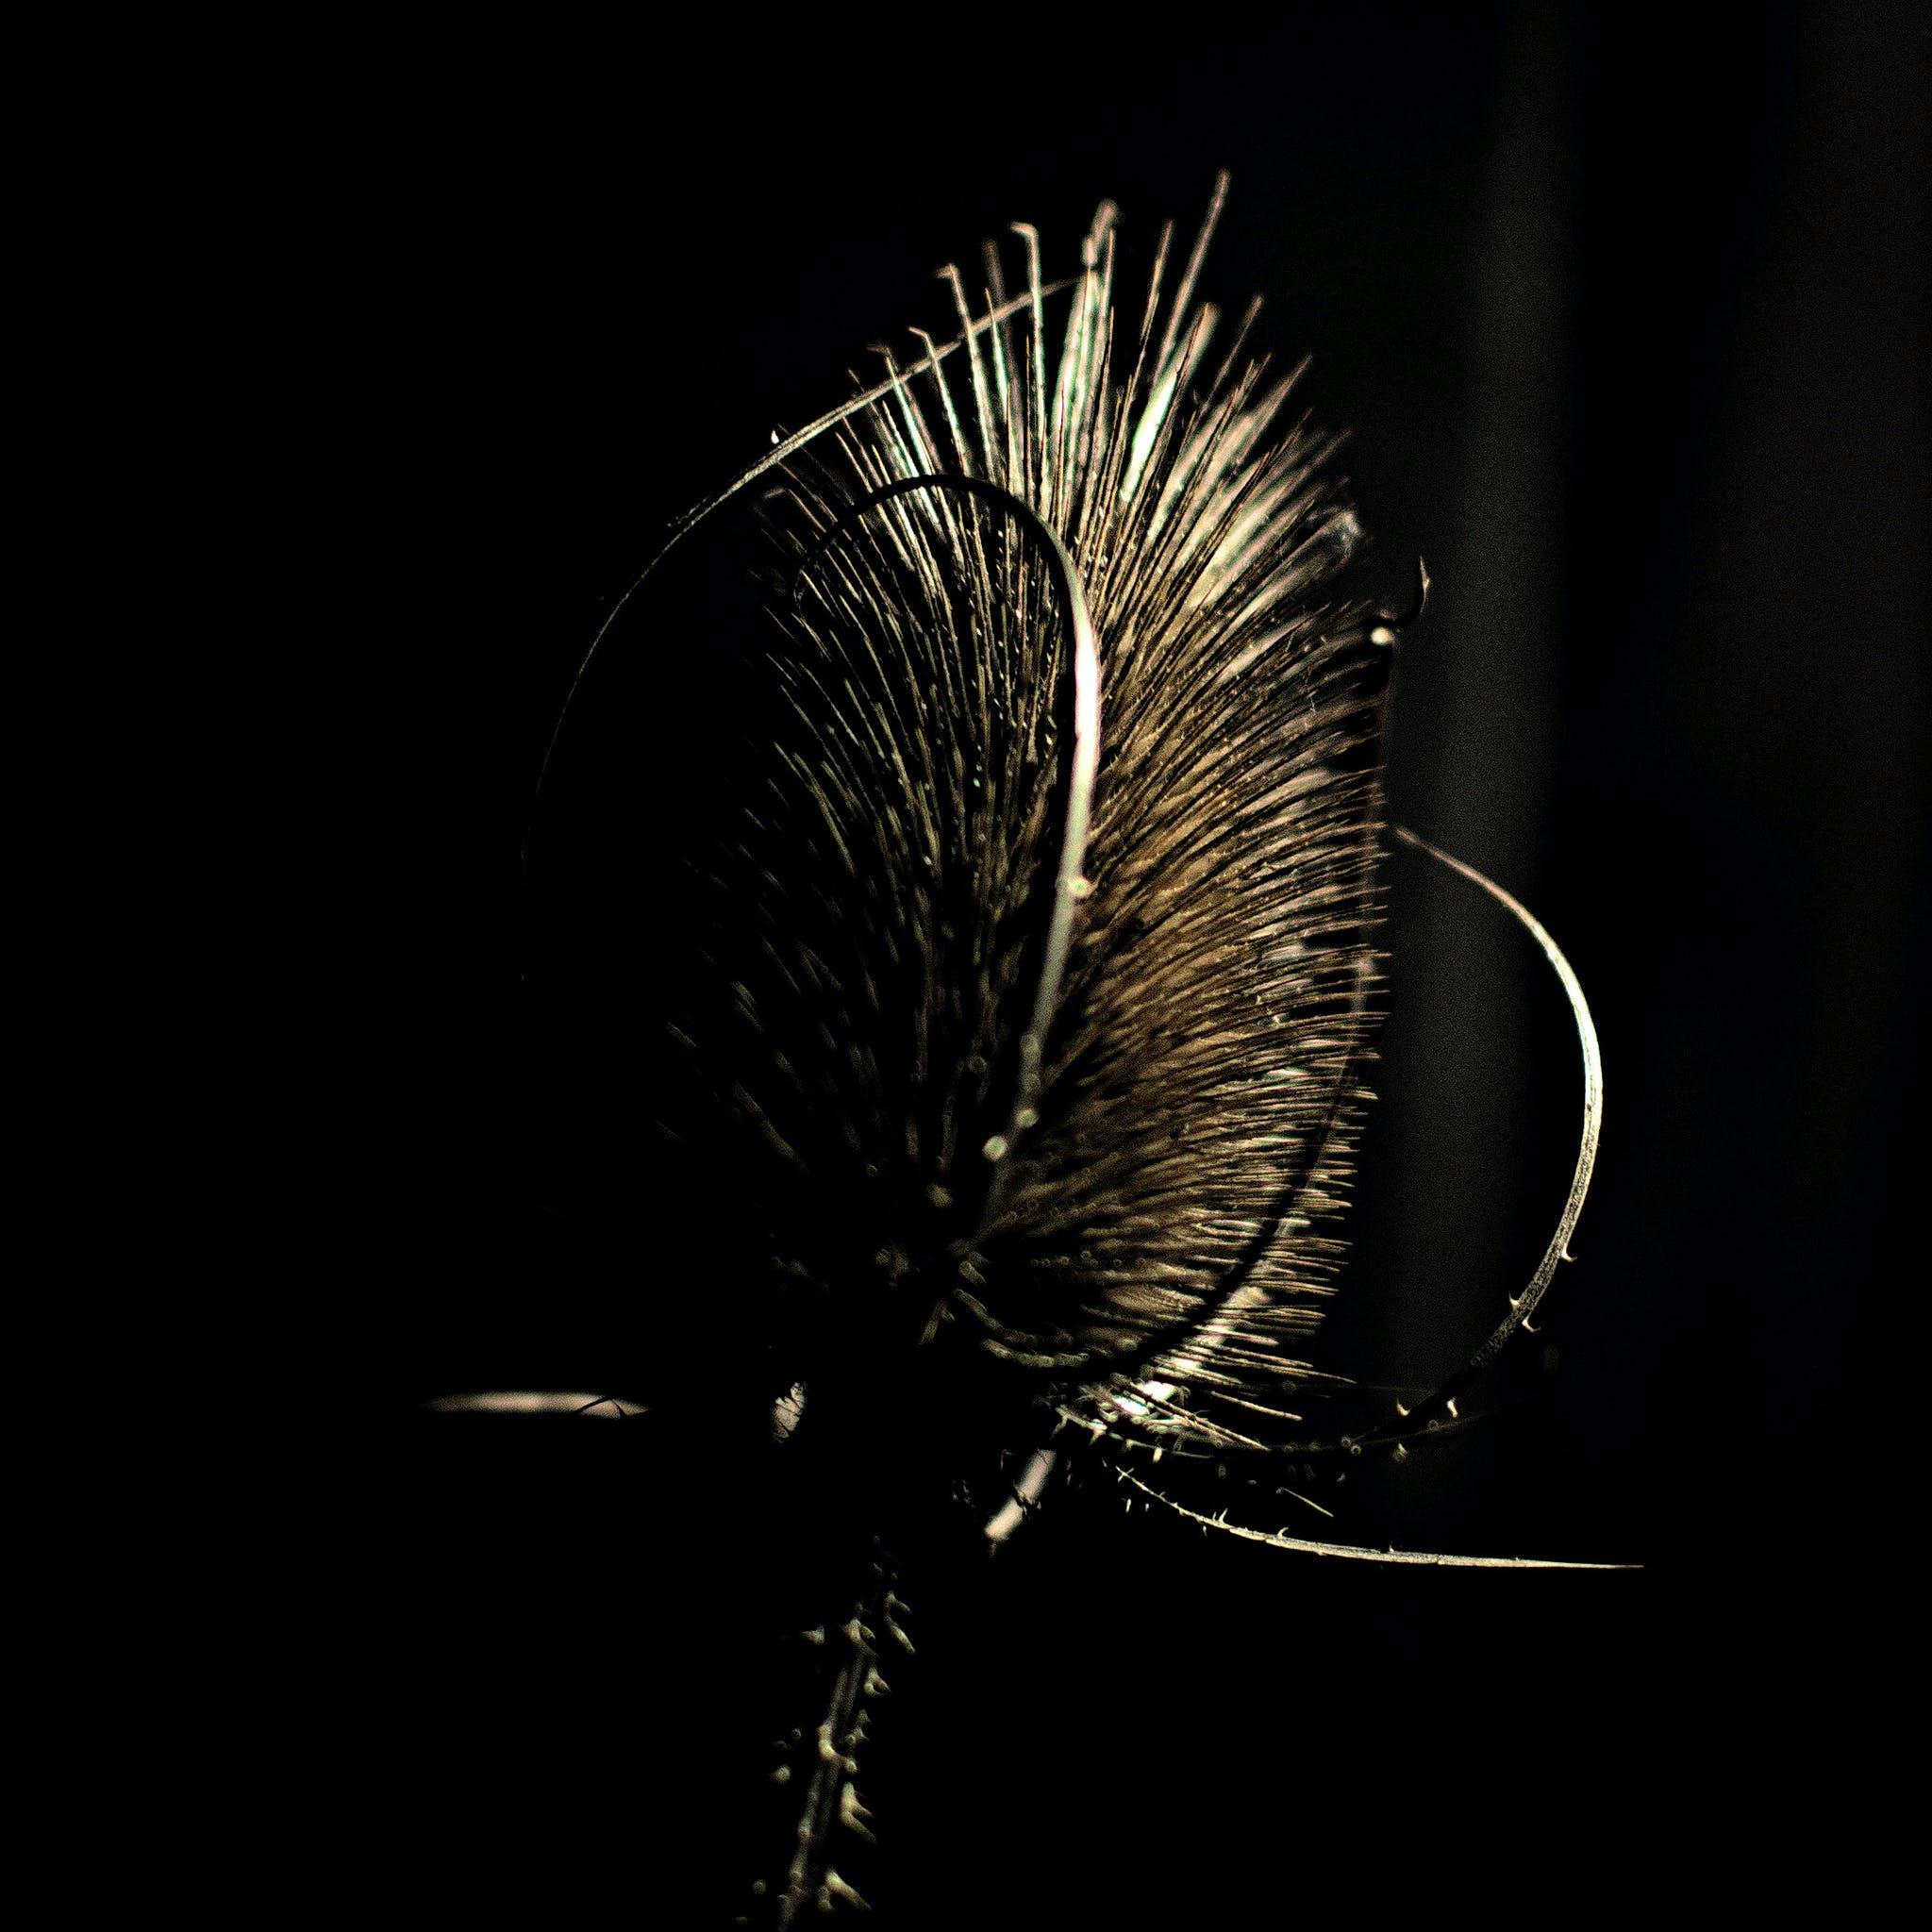 Free stock photo of cactus flower, cardoon, nature morte, piquant